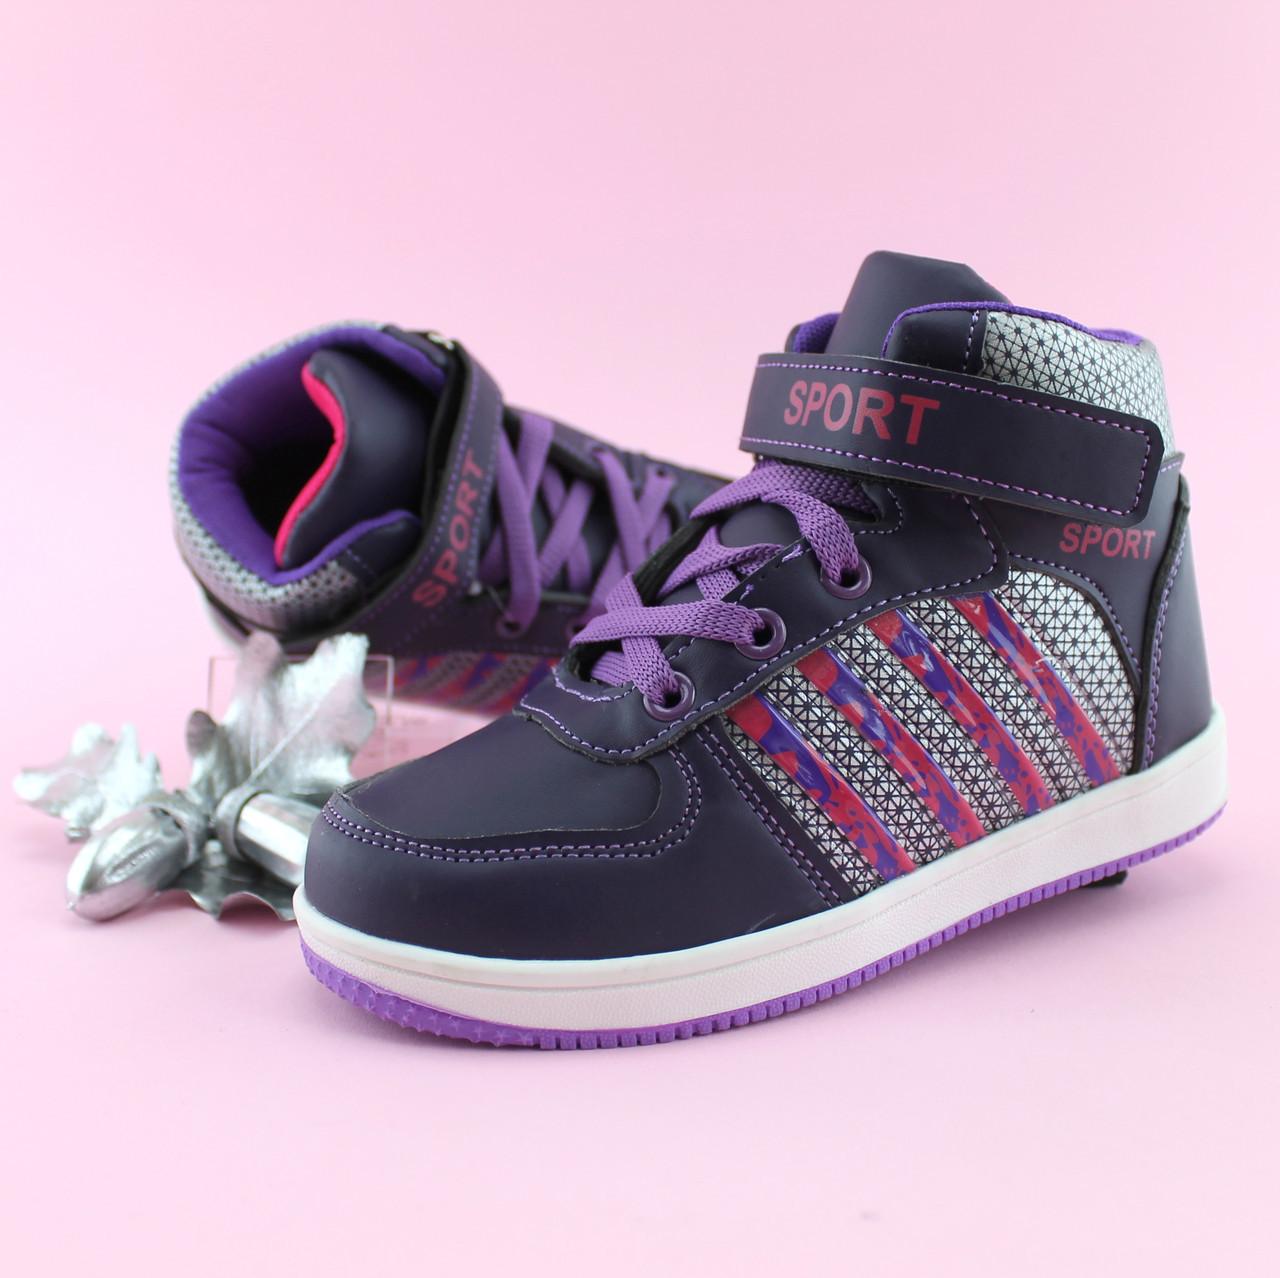 Кроссовки Ботинки демисезонные на девочку тм Tom.m р.25,29,30